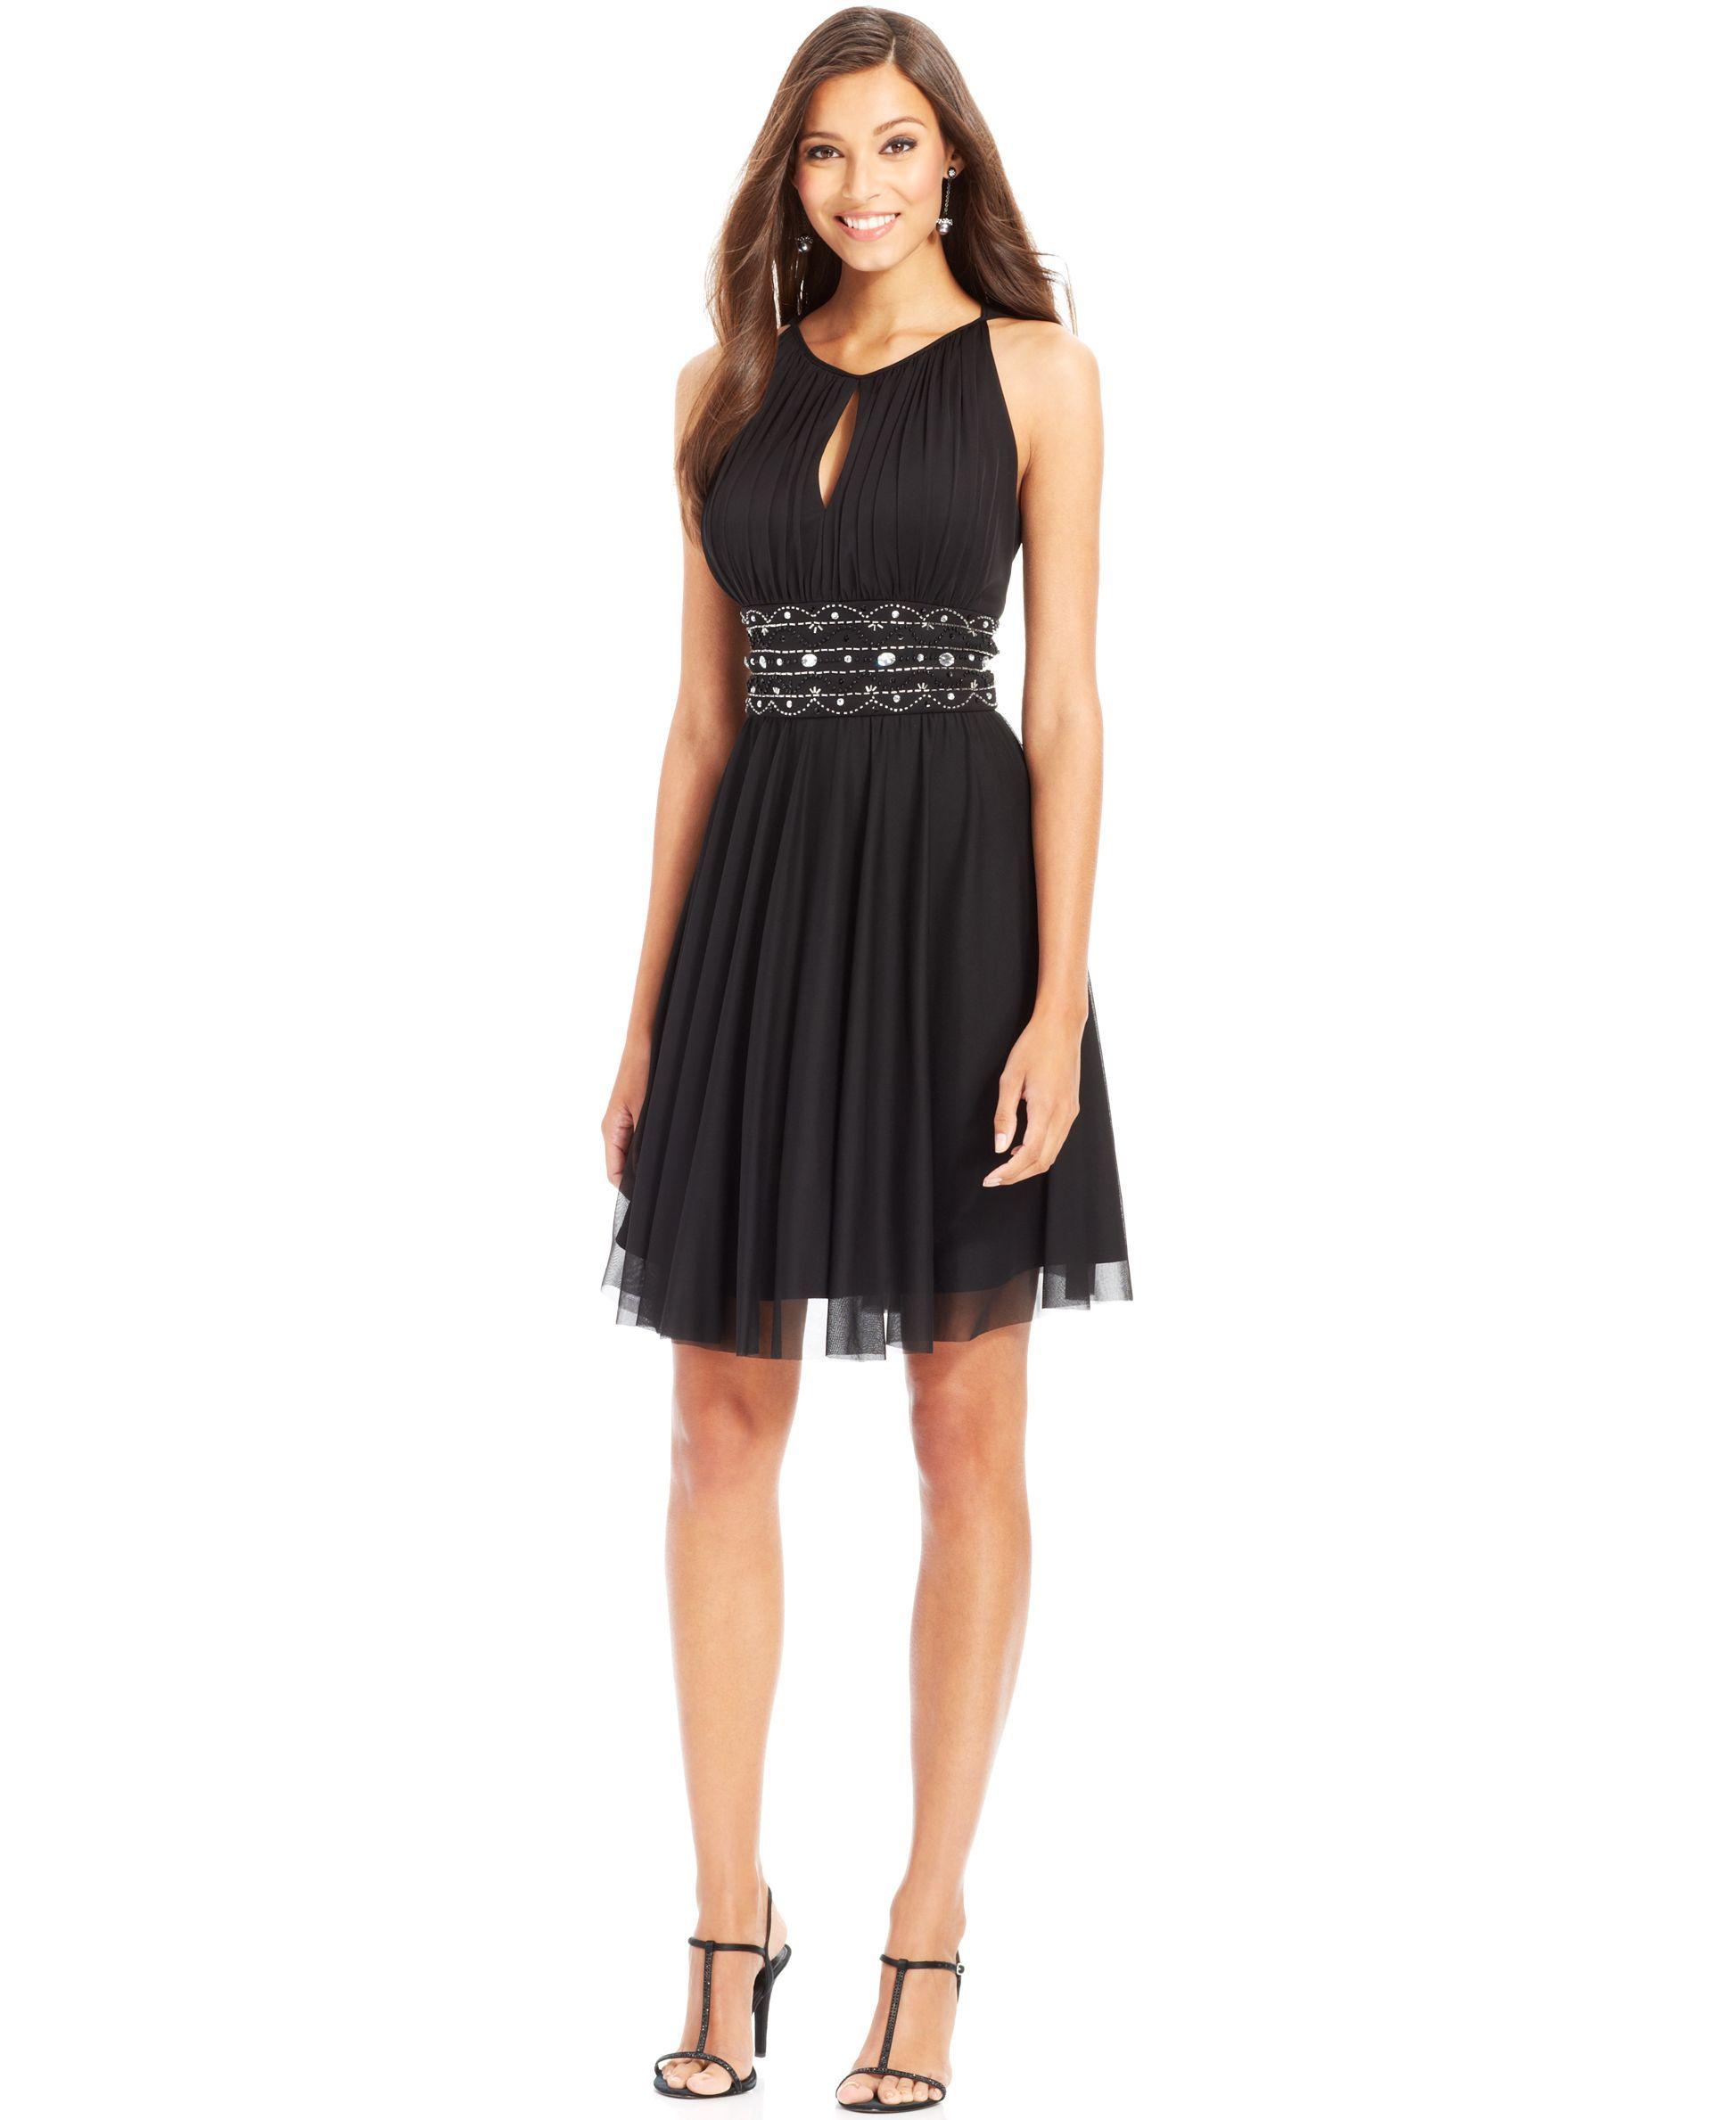 2b27a80dc08c Jessica Howard Sleeveless Keyhole Embellished Dress - need this in ivory!